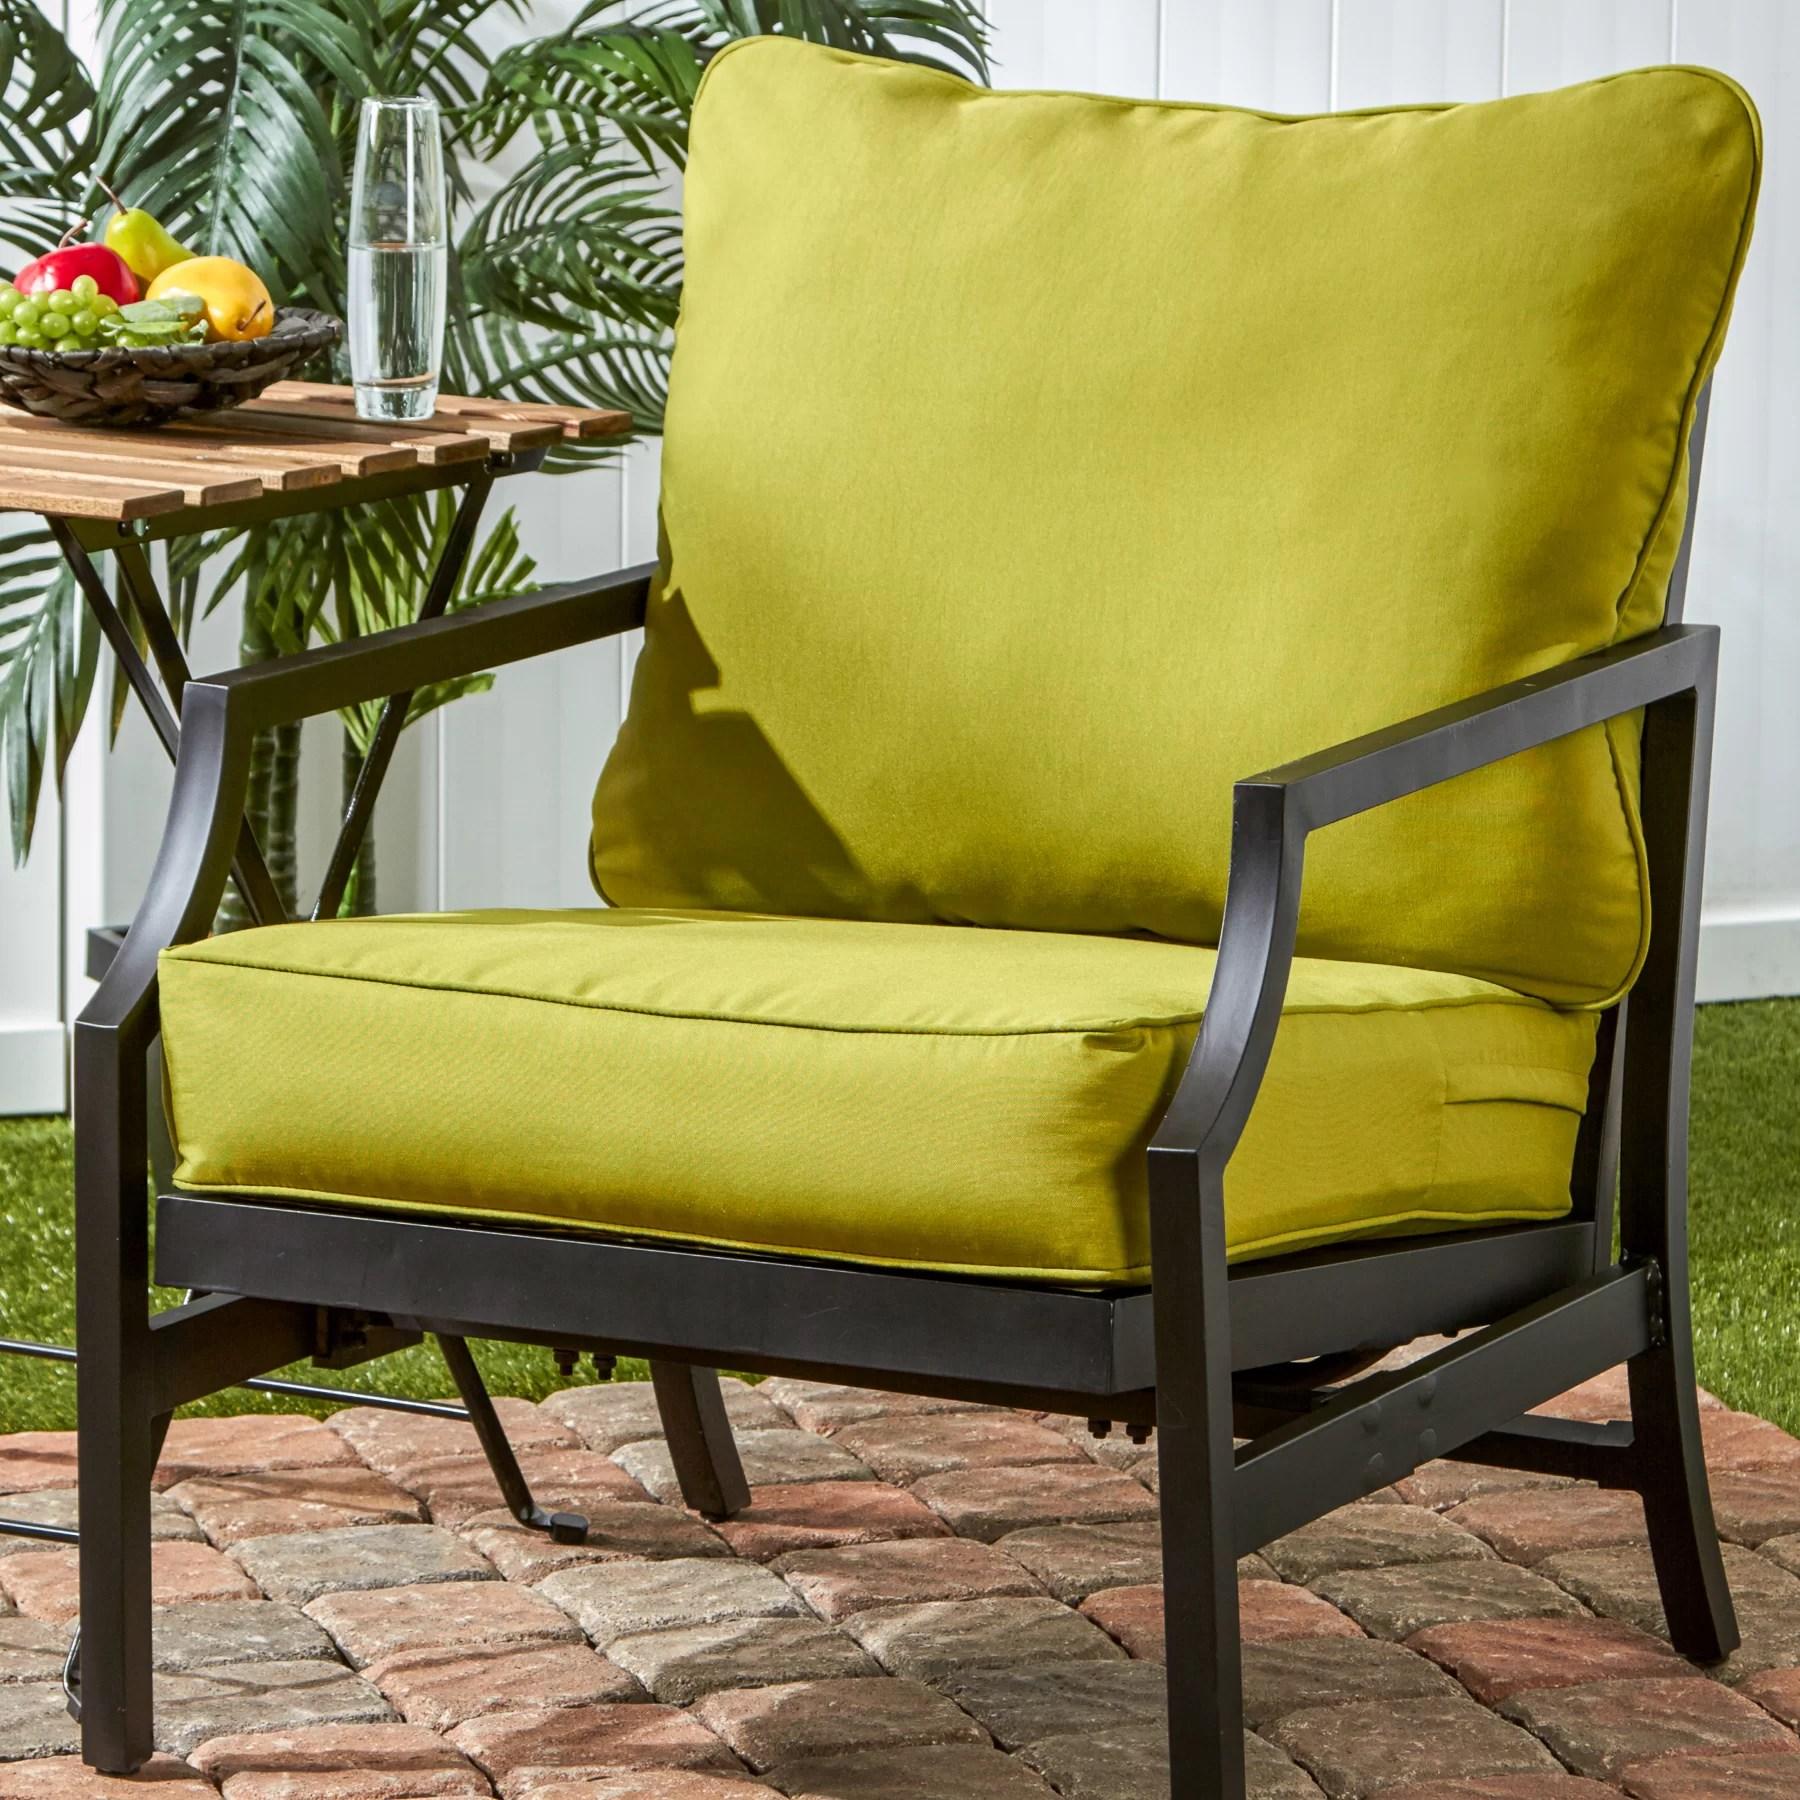 Greendale Home Fashions Outdoor Lounge Chair Cushion  Reviews  Wayfair